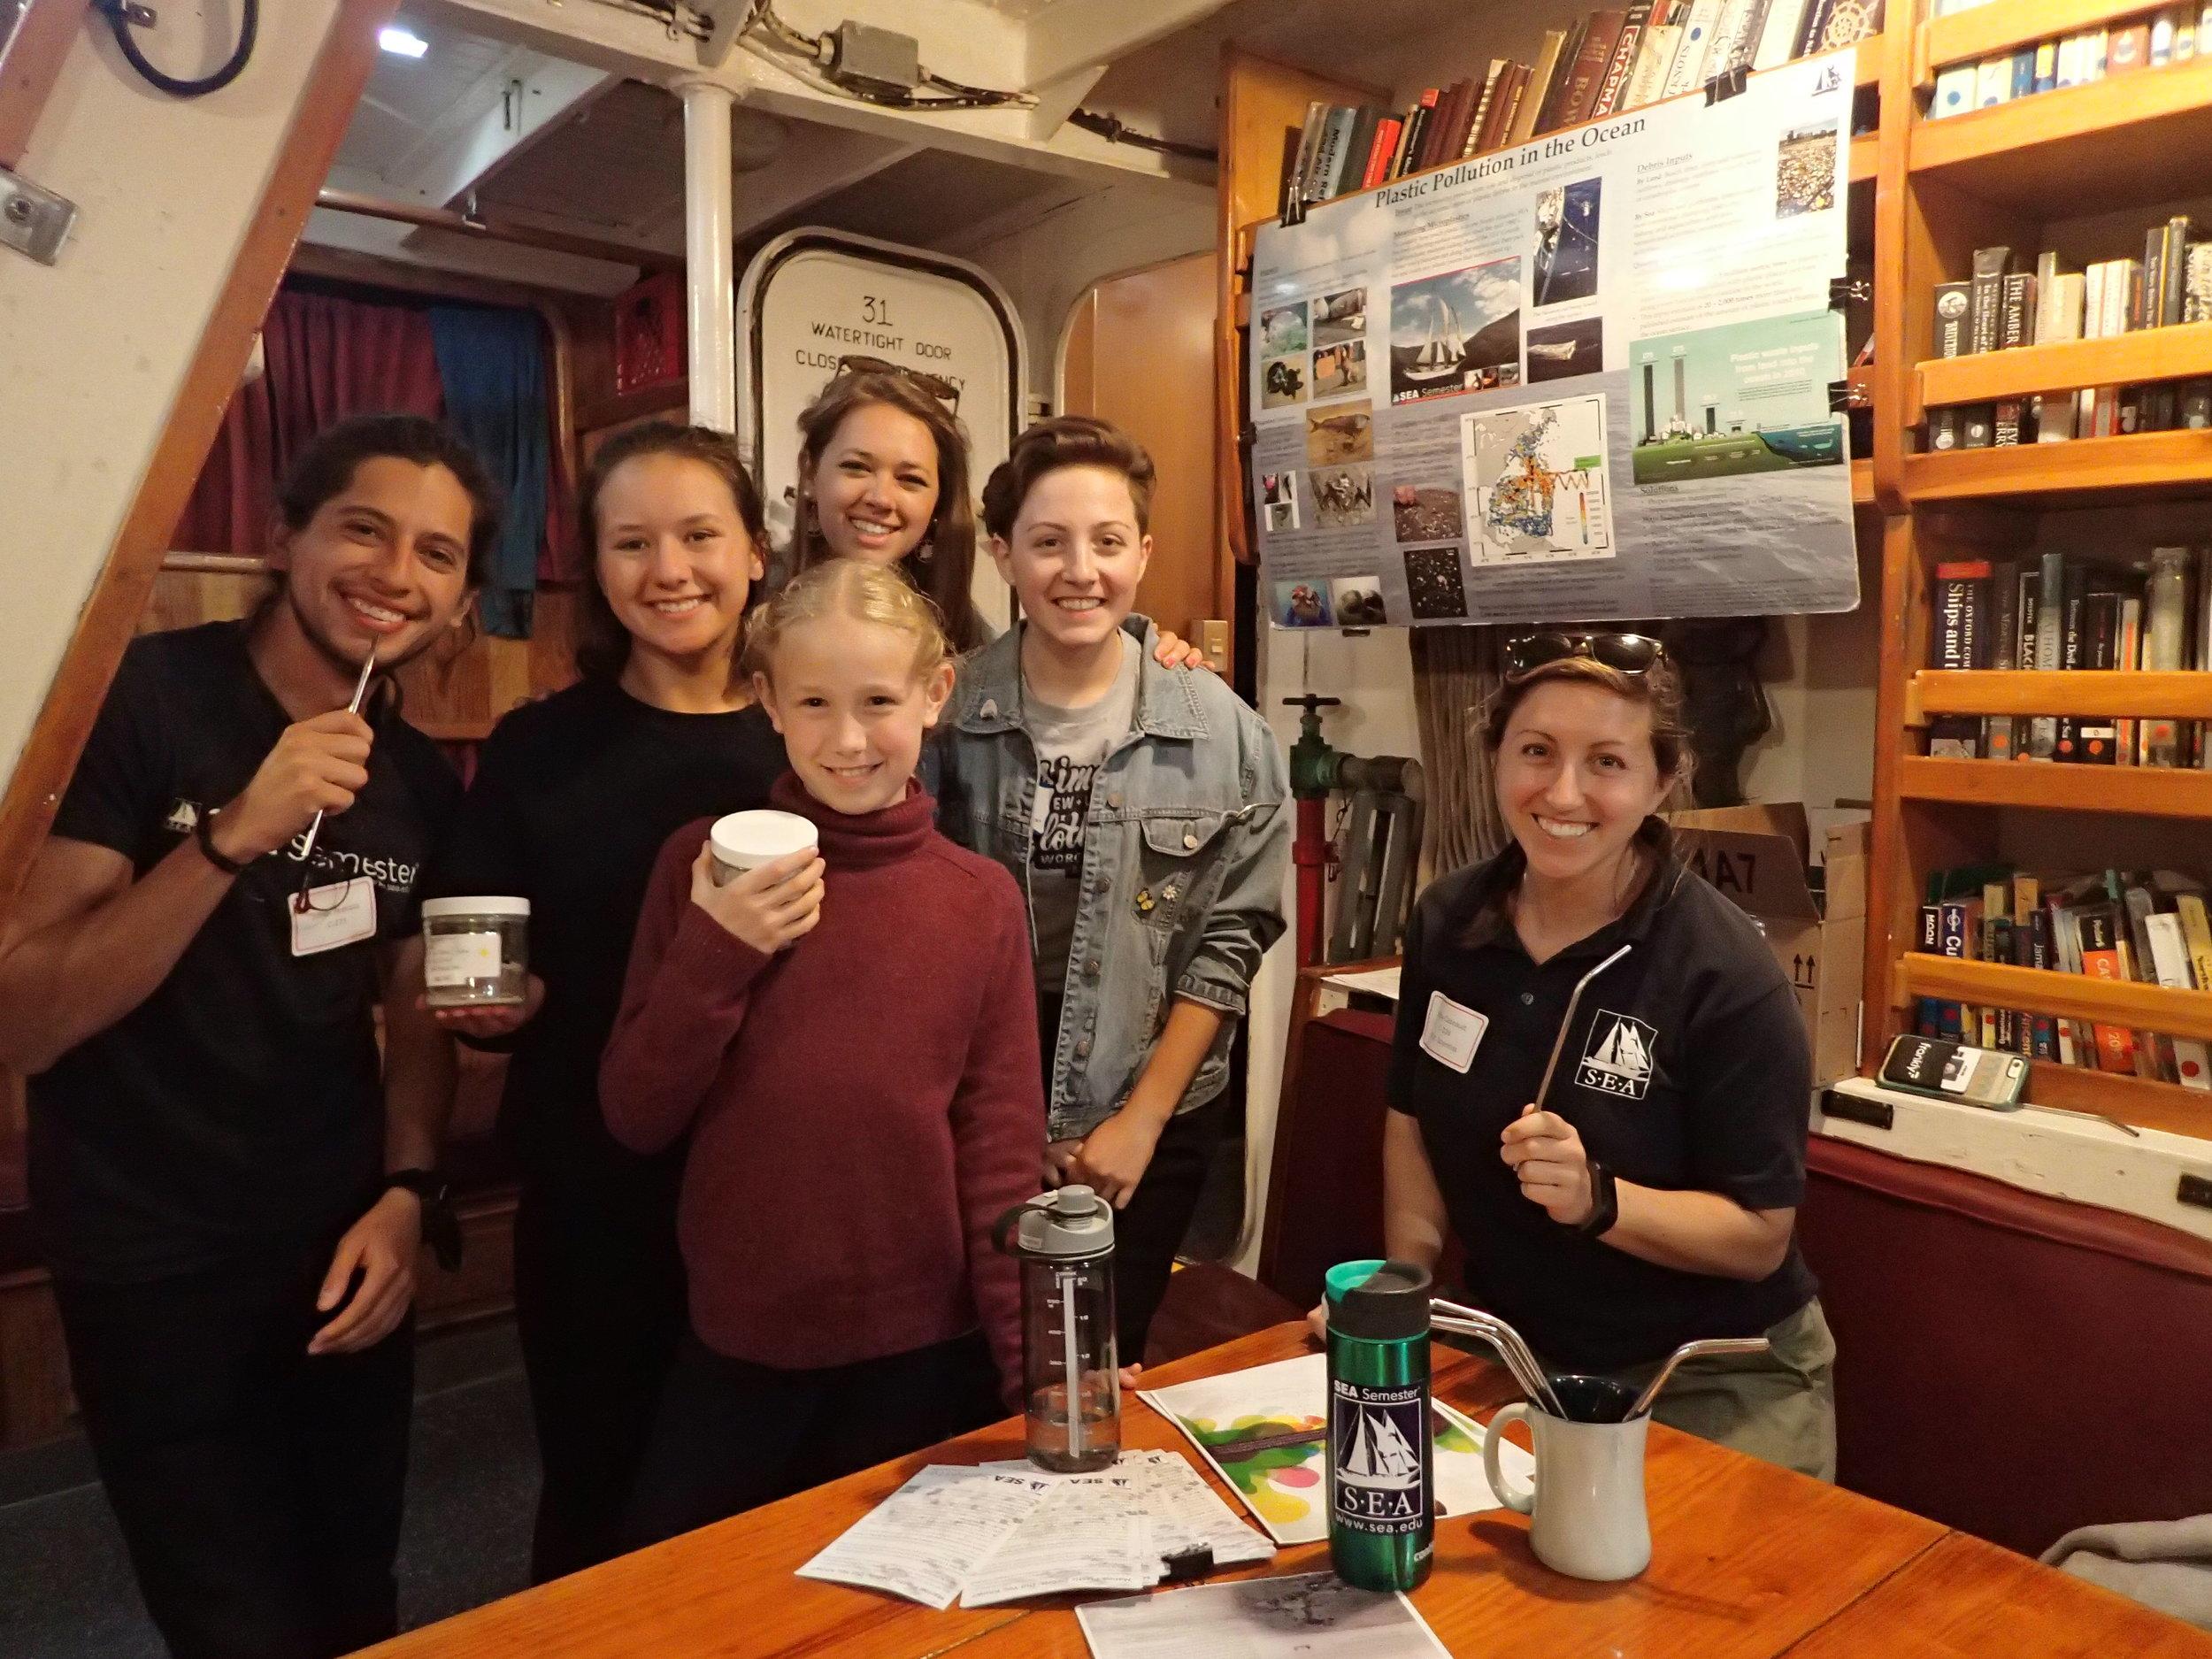 2017 06 03 Cramer SUPR open ship students, crew, 5th grader.JPG